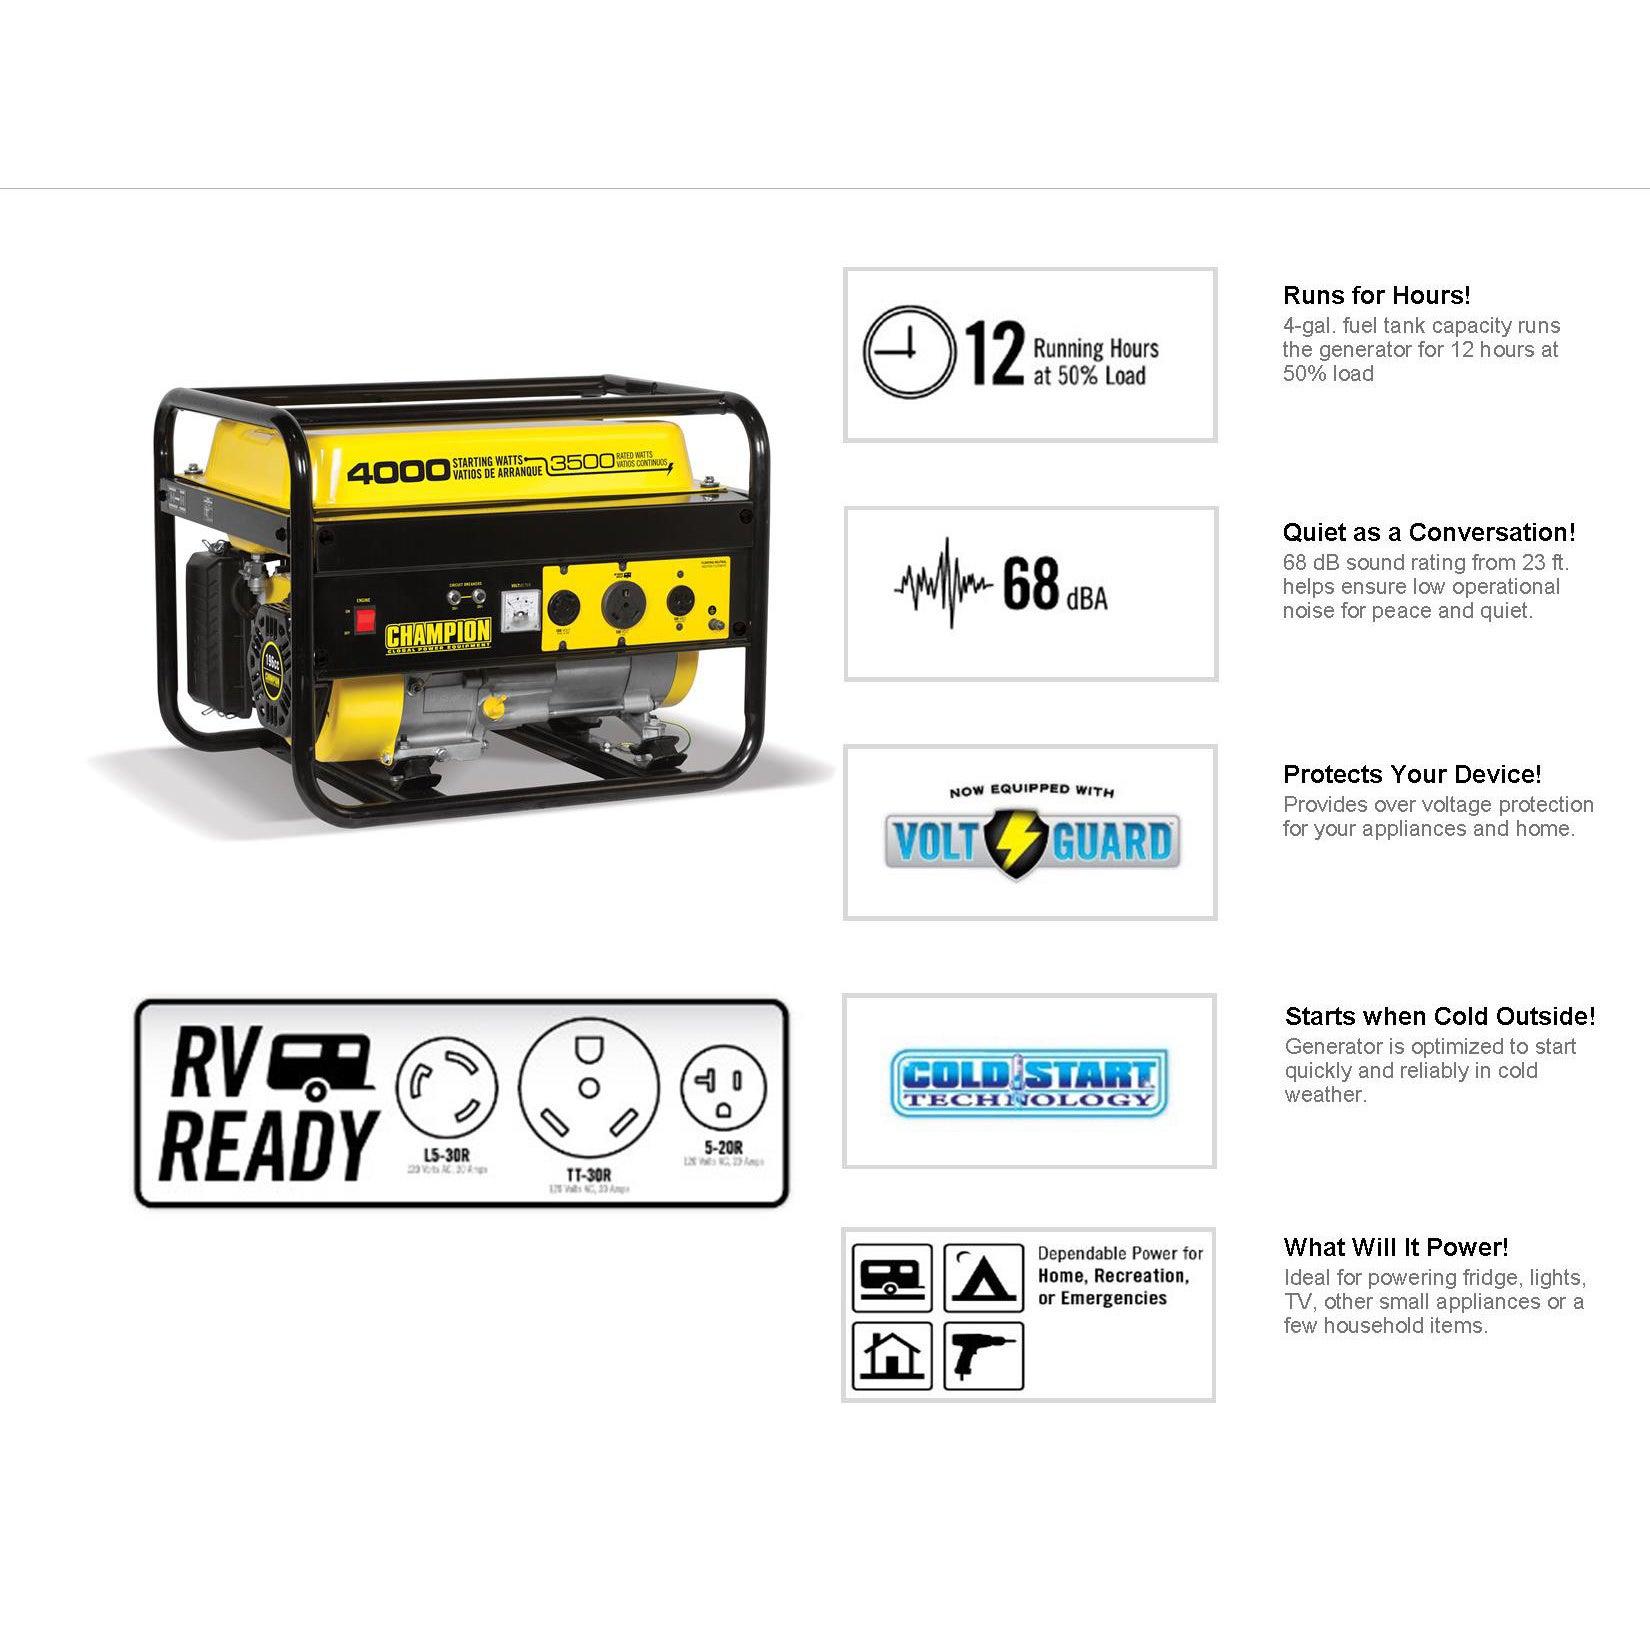 Champion 3500 Watt RV Ready Portable Generator CARB Free